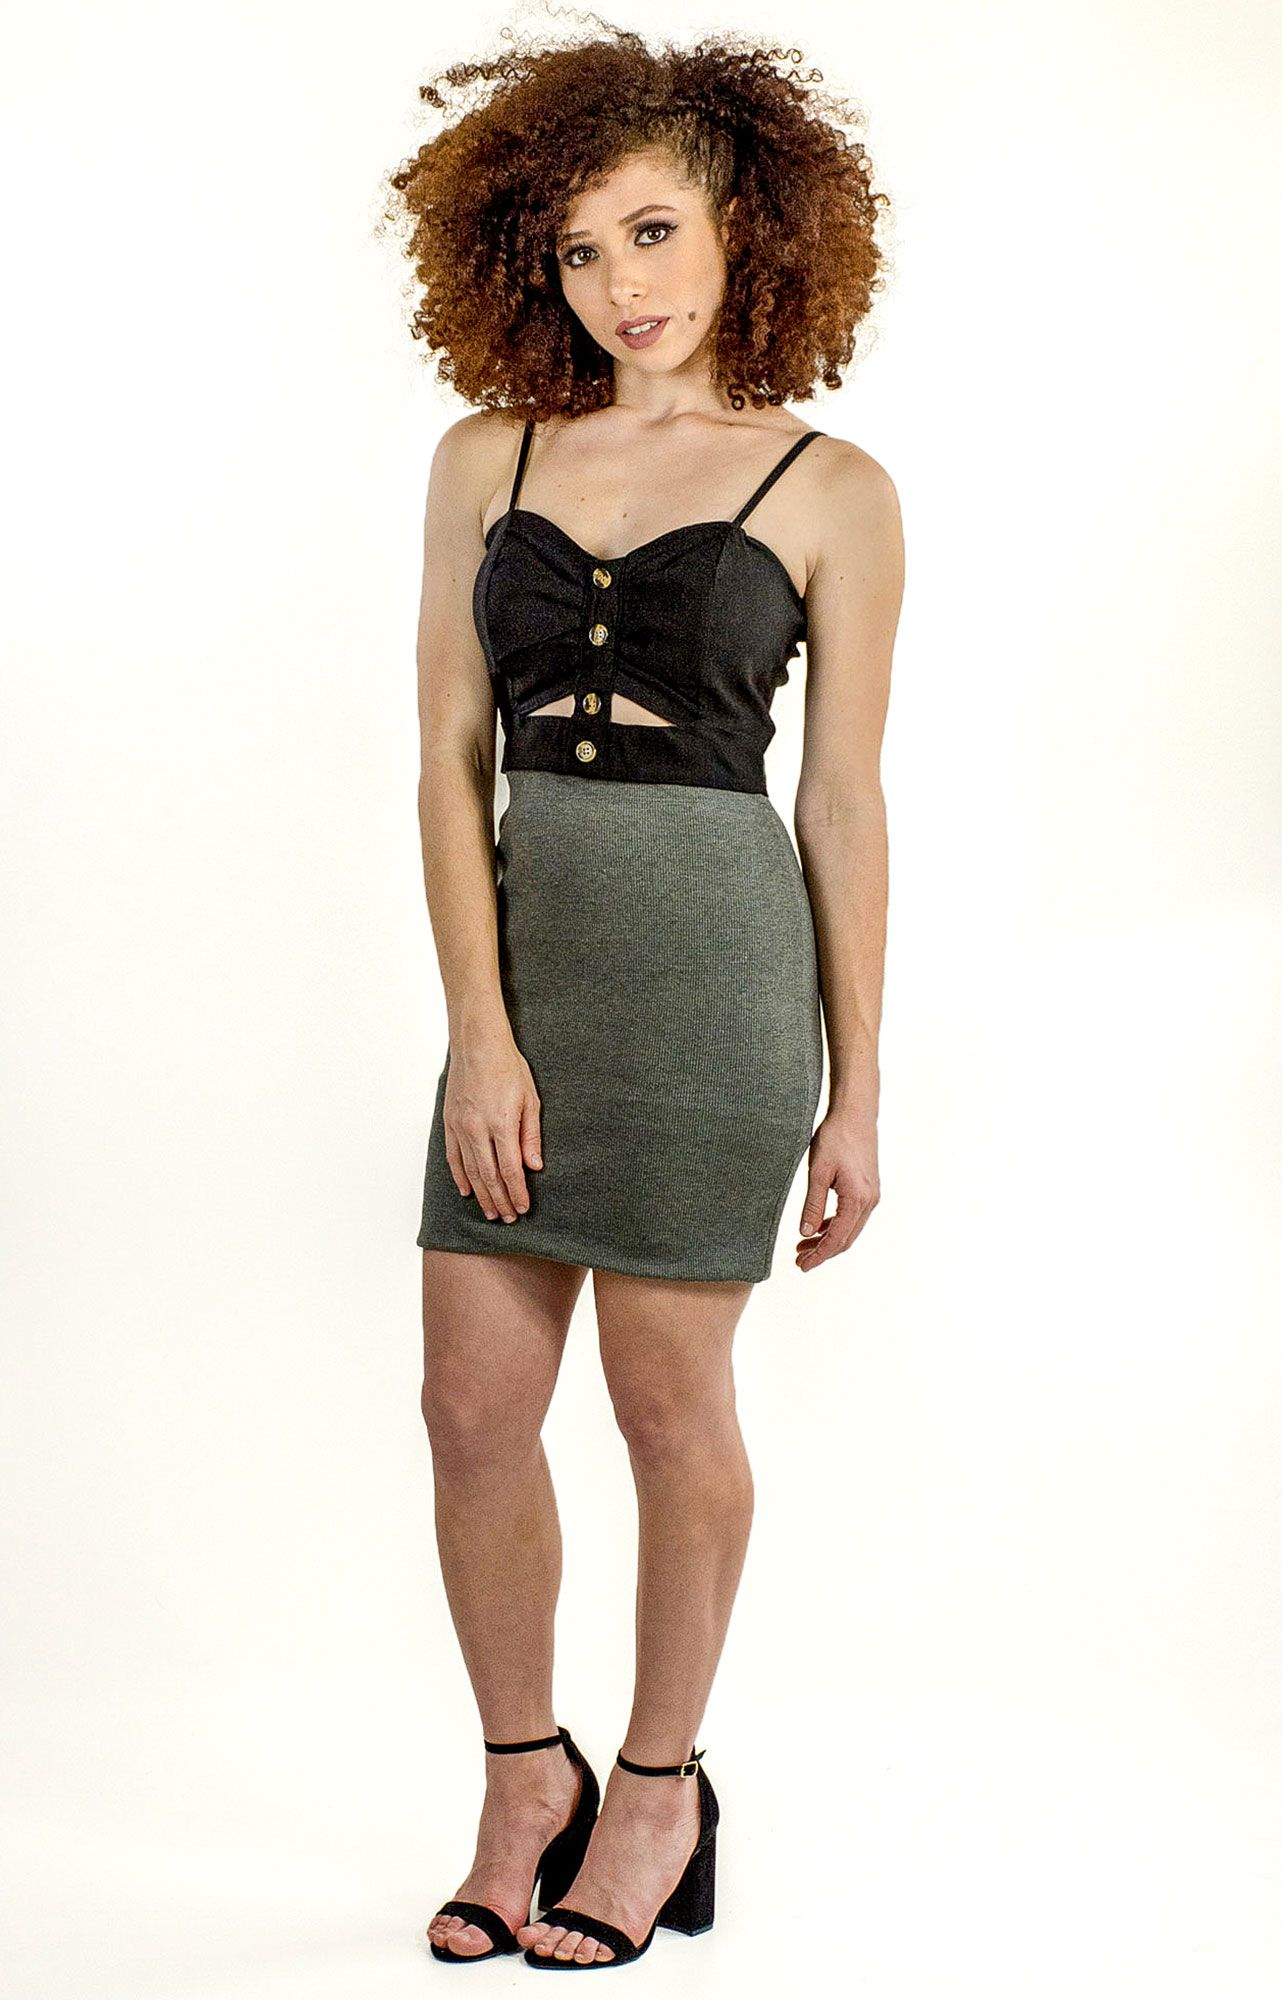 18b8896cf NotoriaStore: Moda Feminina Florianópolis - Online Cropped de alça fina